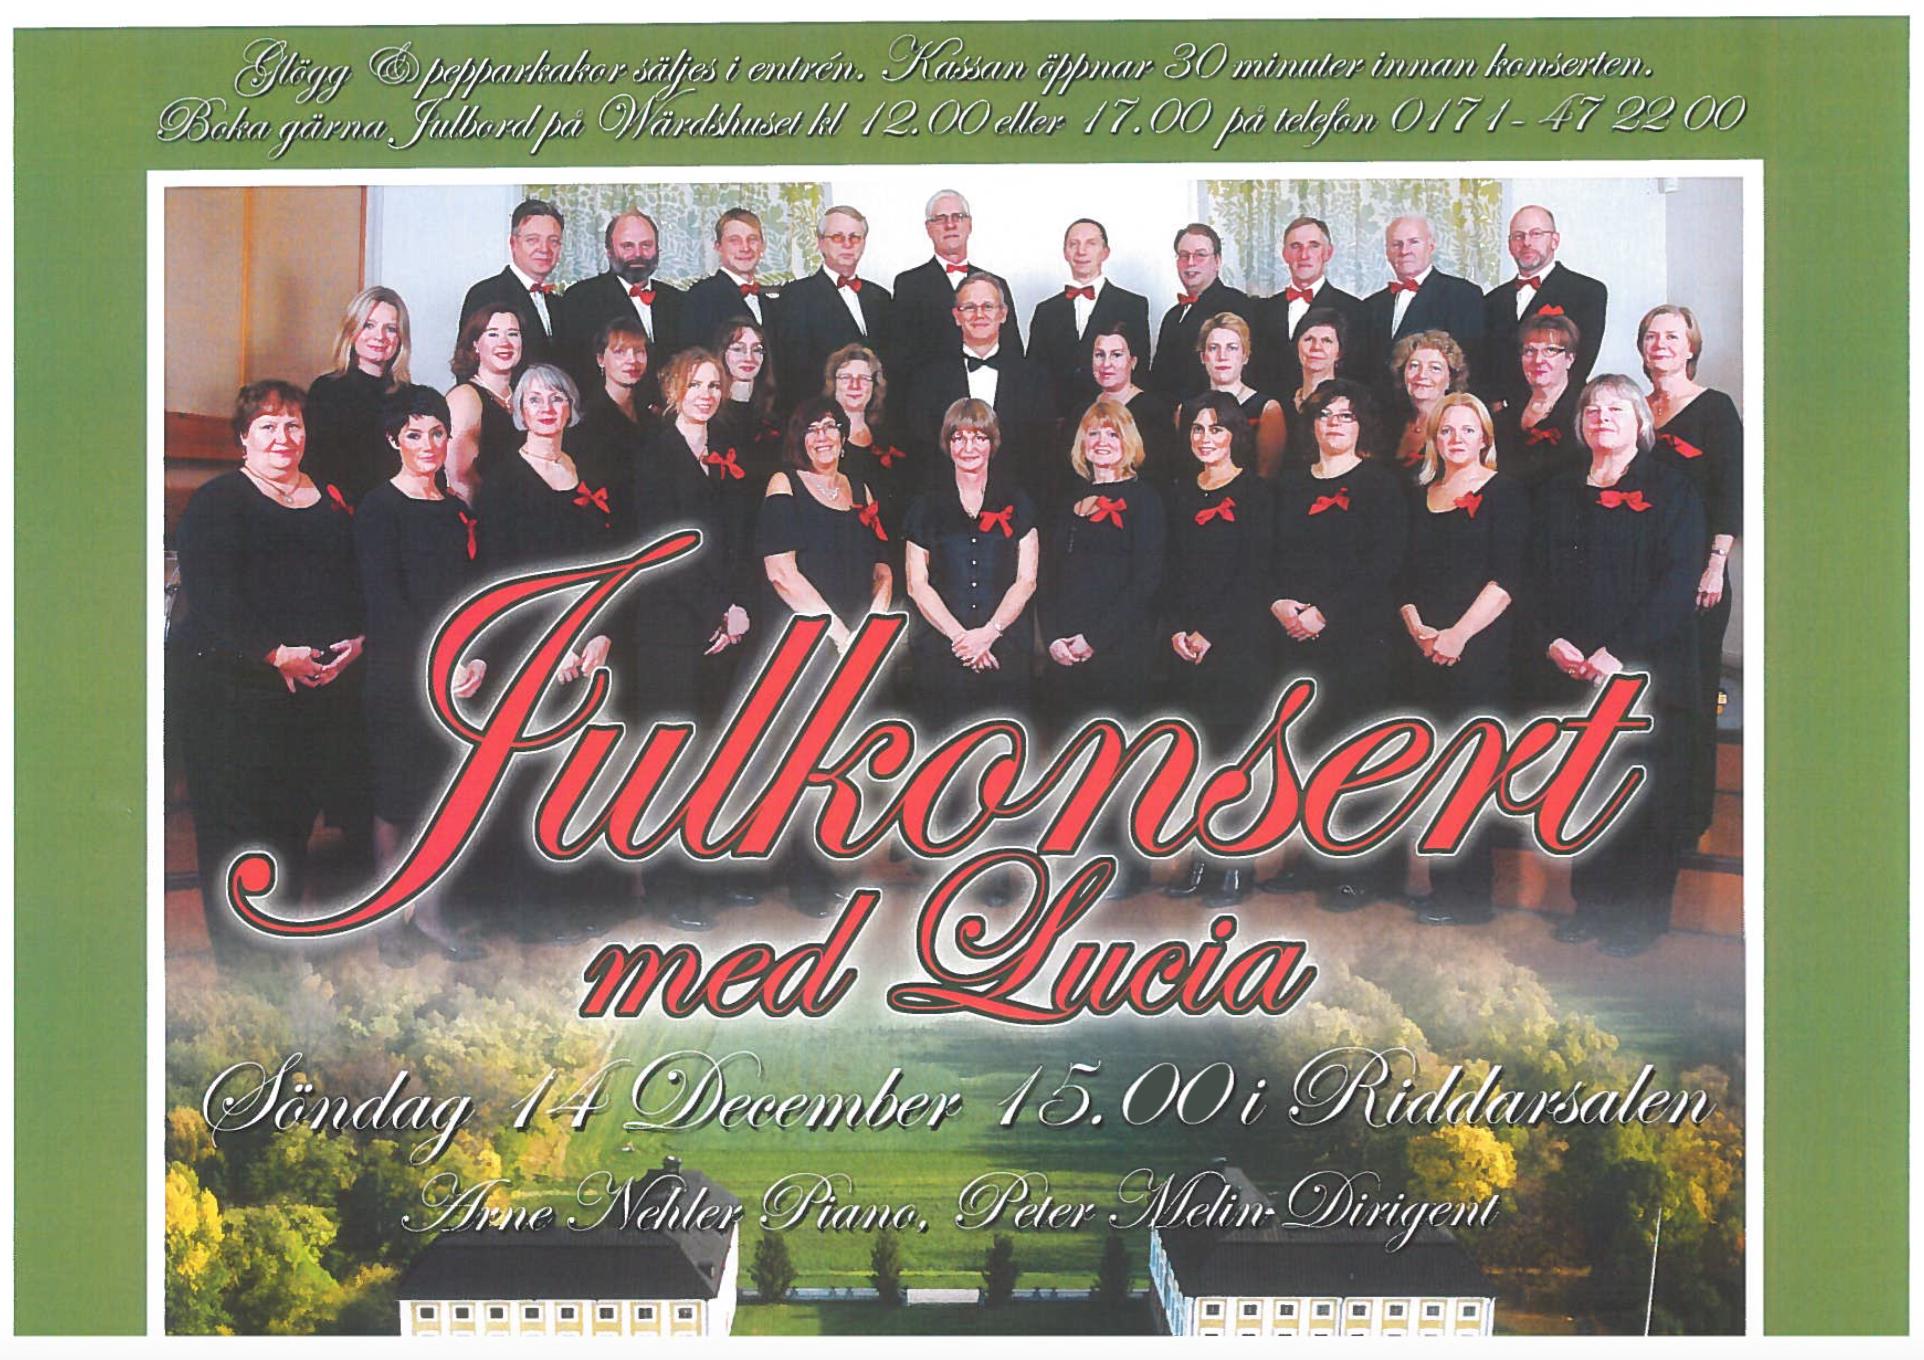 2008-affisch-julkonsert-med-lucia-med-enkopings-kammarkor